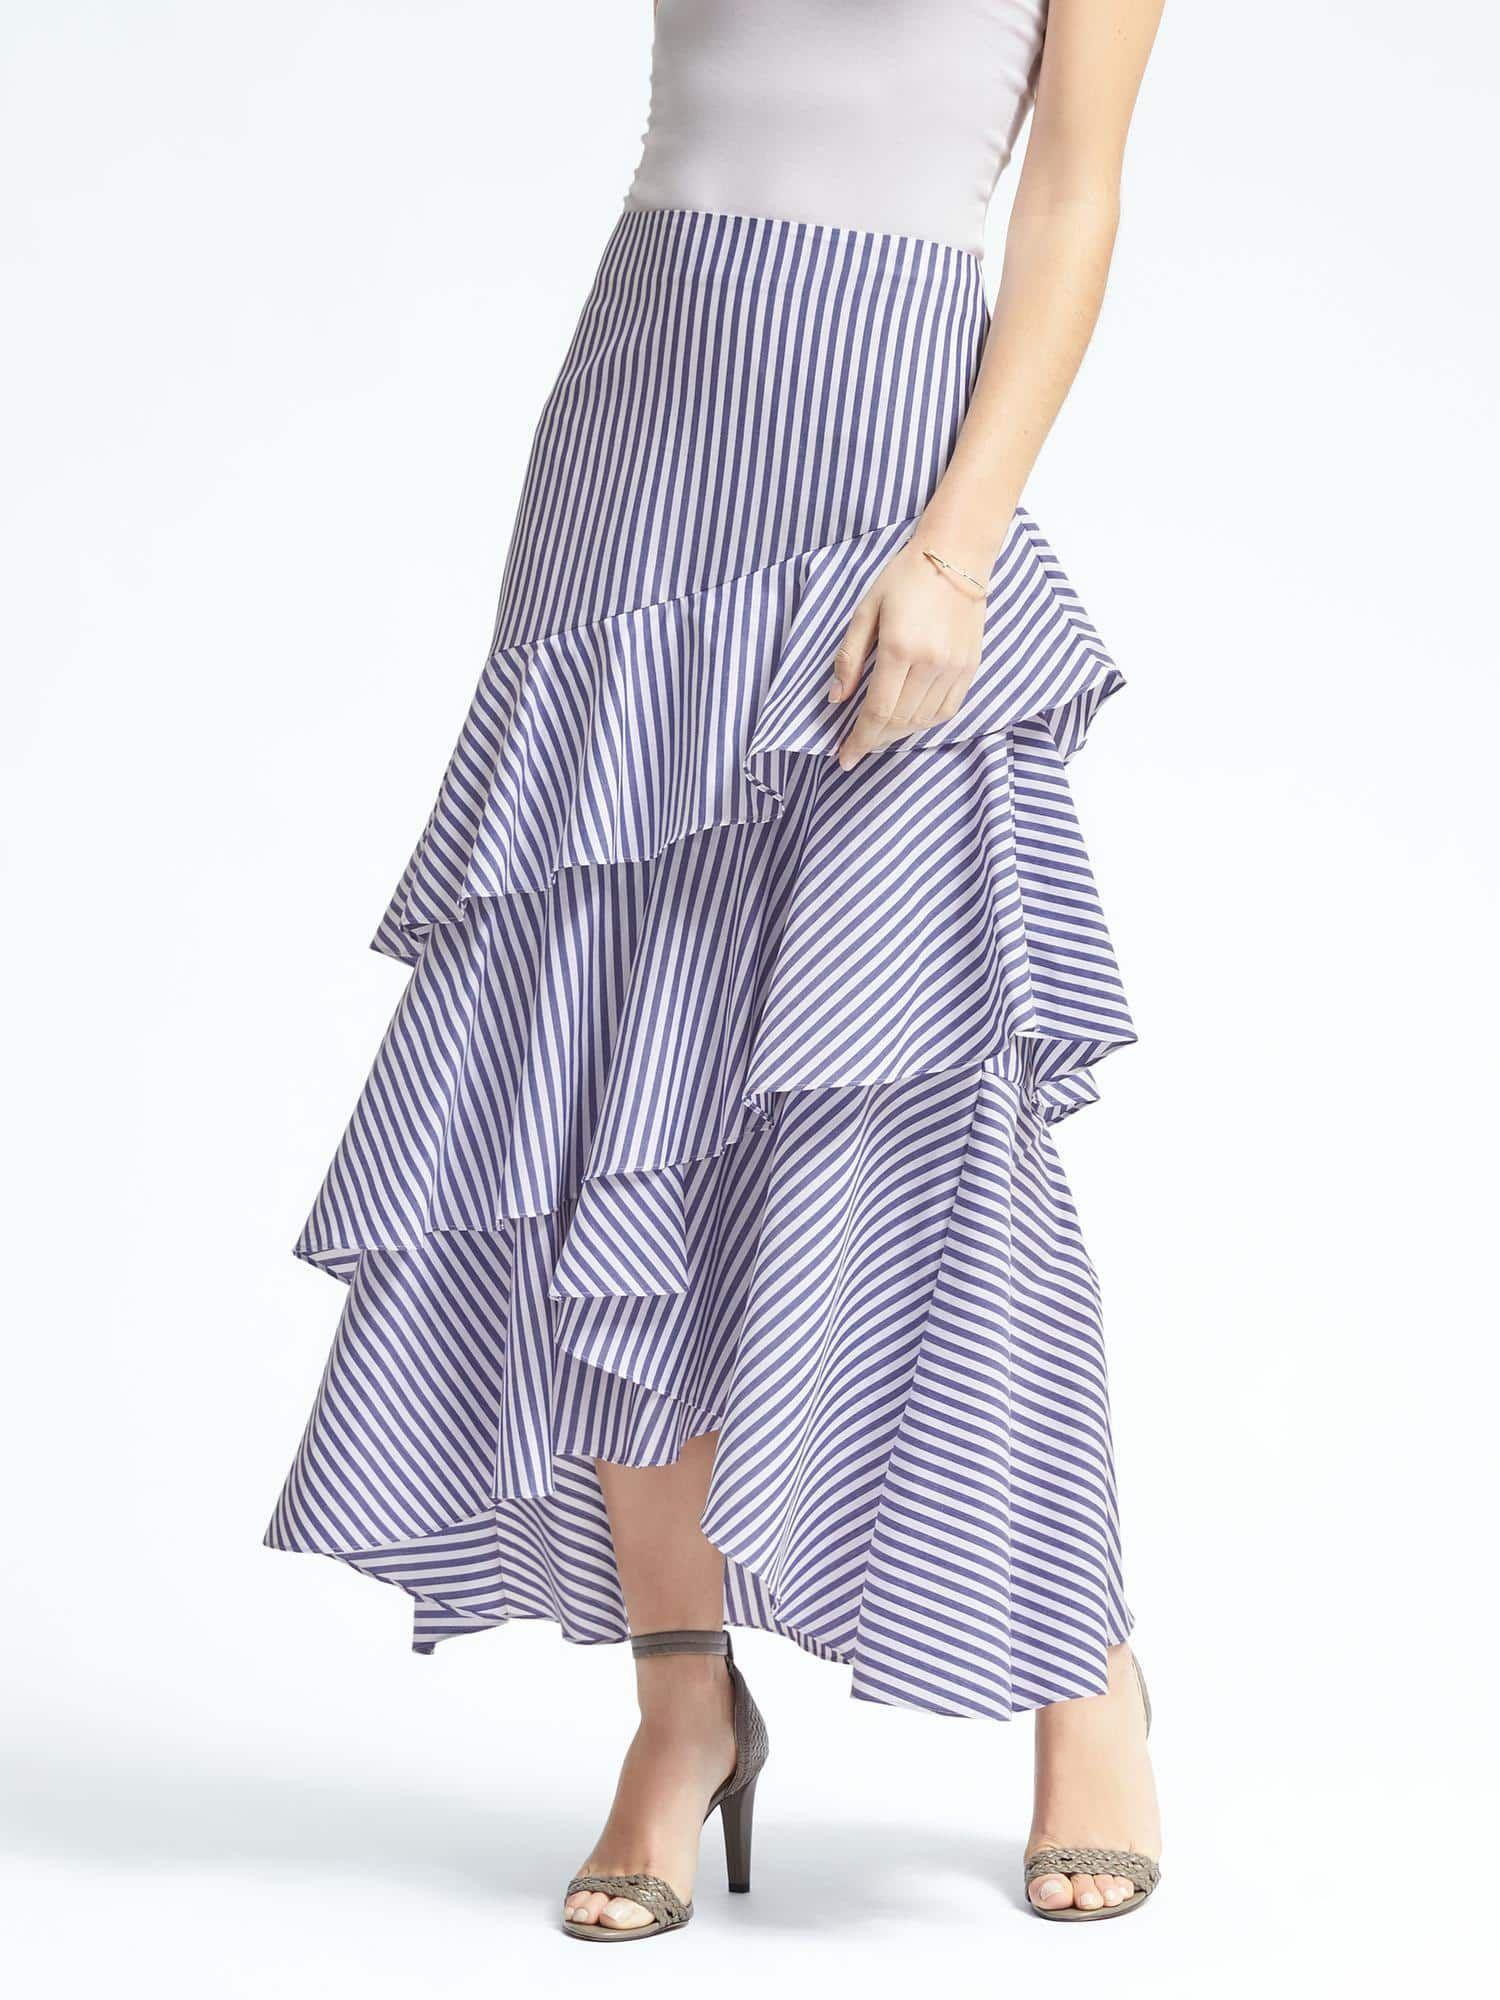 Banana republic tiered ruffled maxi skirt my style